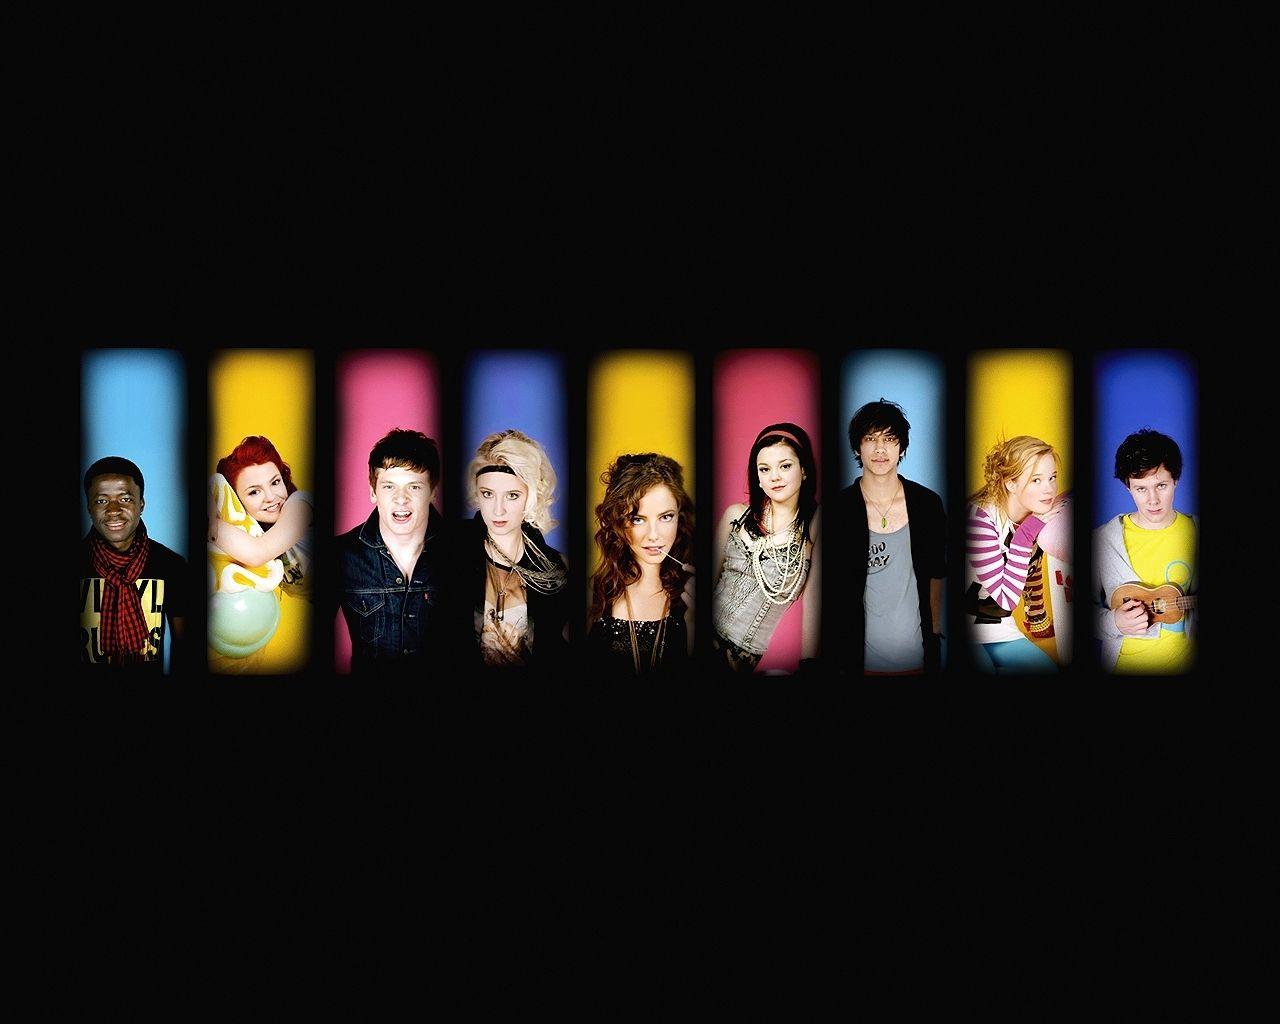 Fanpop Spots Skins Images 12209505 Title Wallpaper Love It